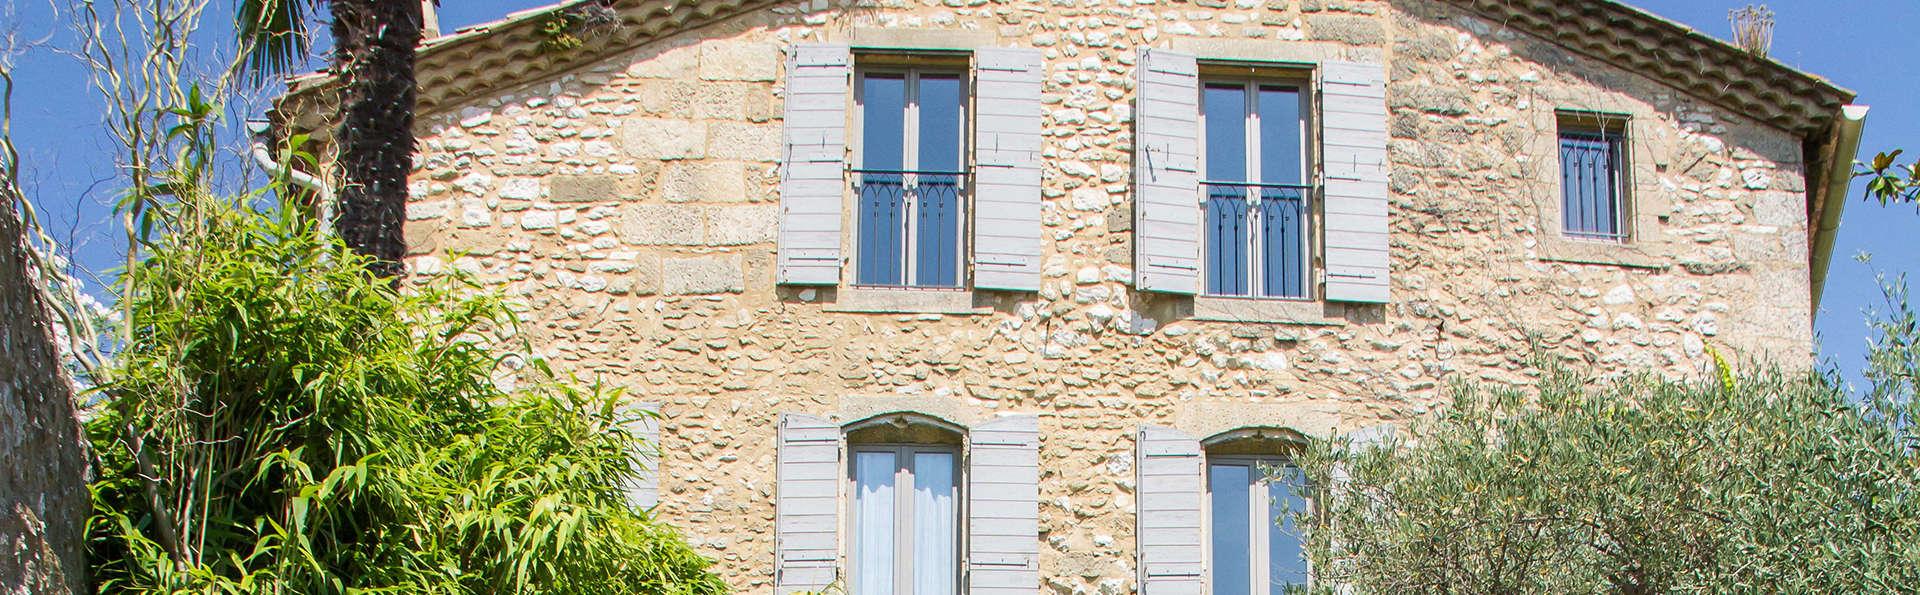 Hostellerie Le Castellas  - edit_facade1.jpg